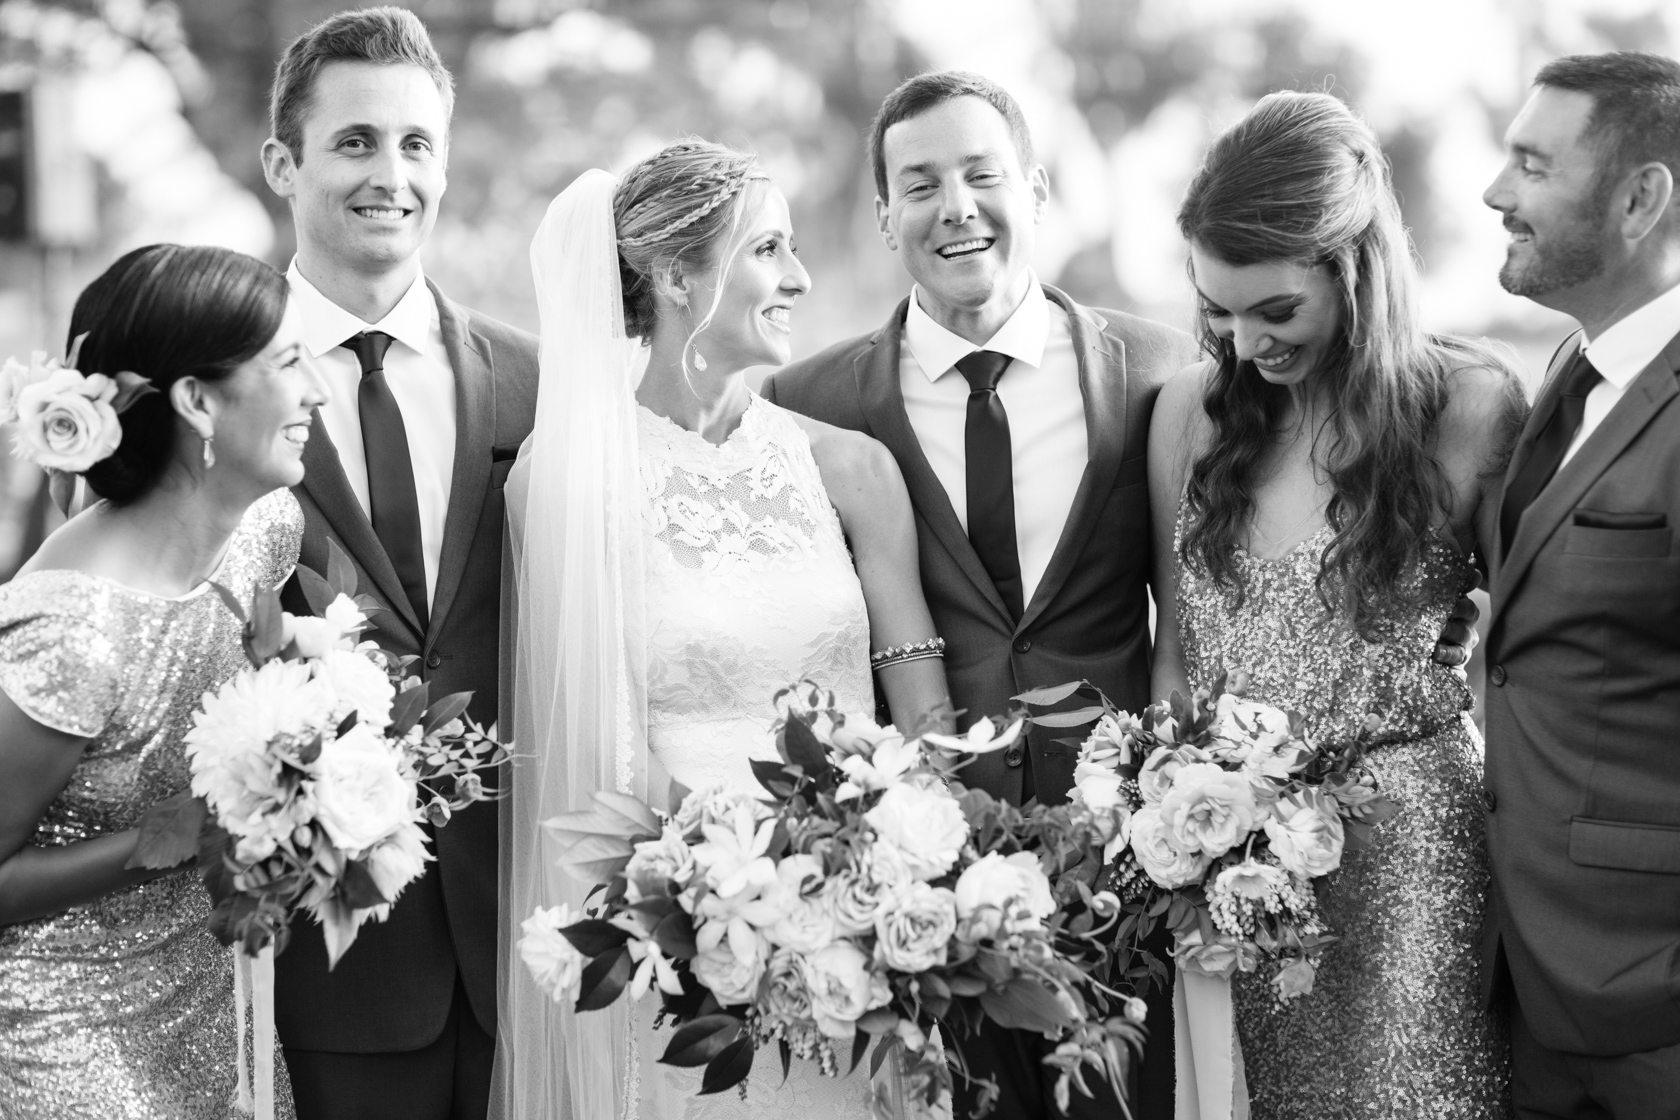 The_Lodge_at_Torrey_Pines_Wedding_005.jpg